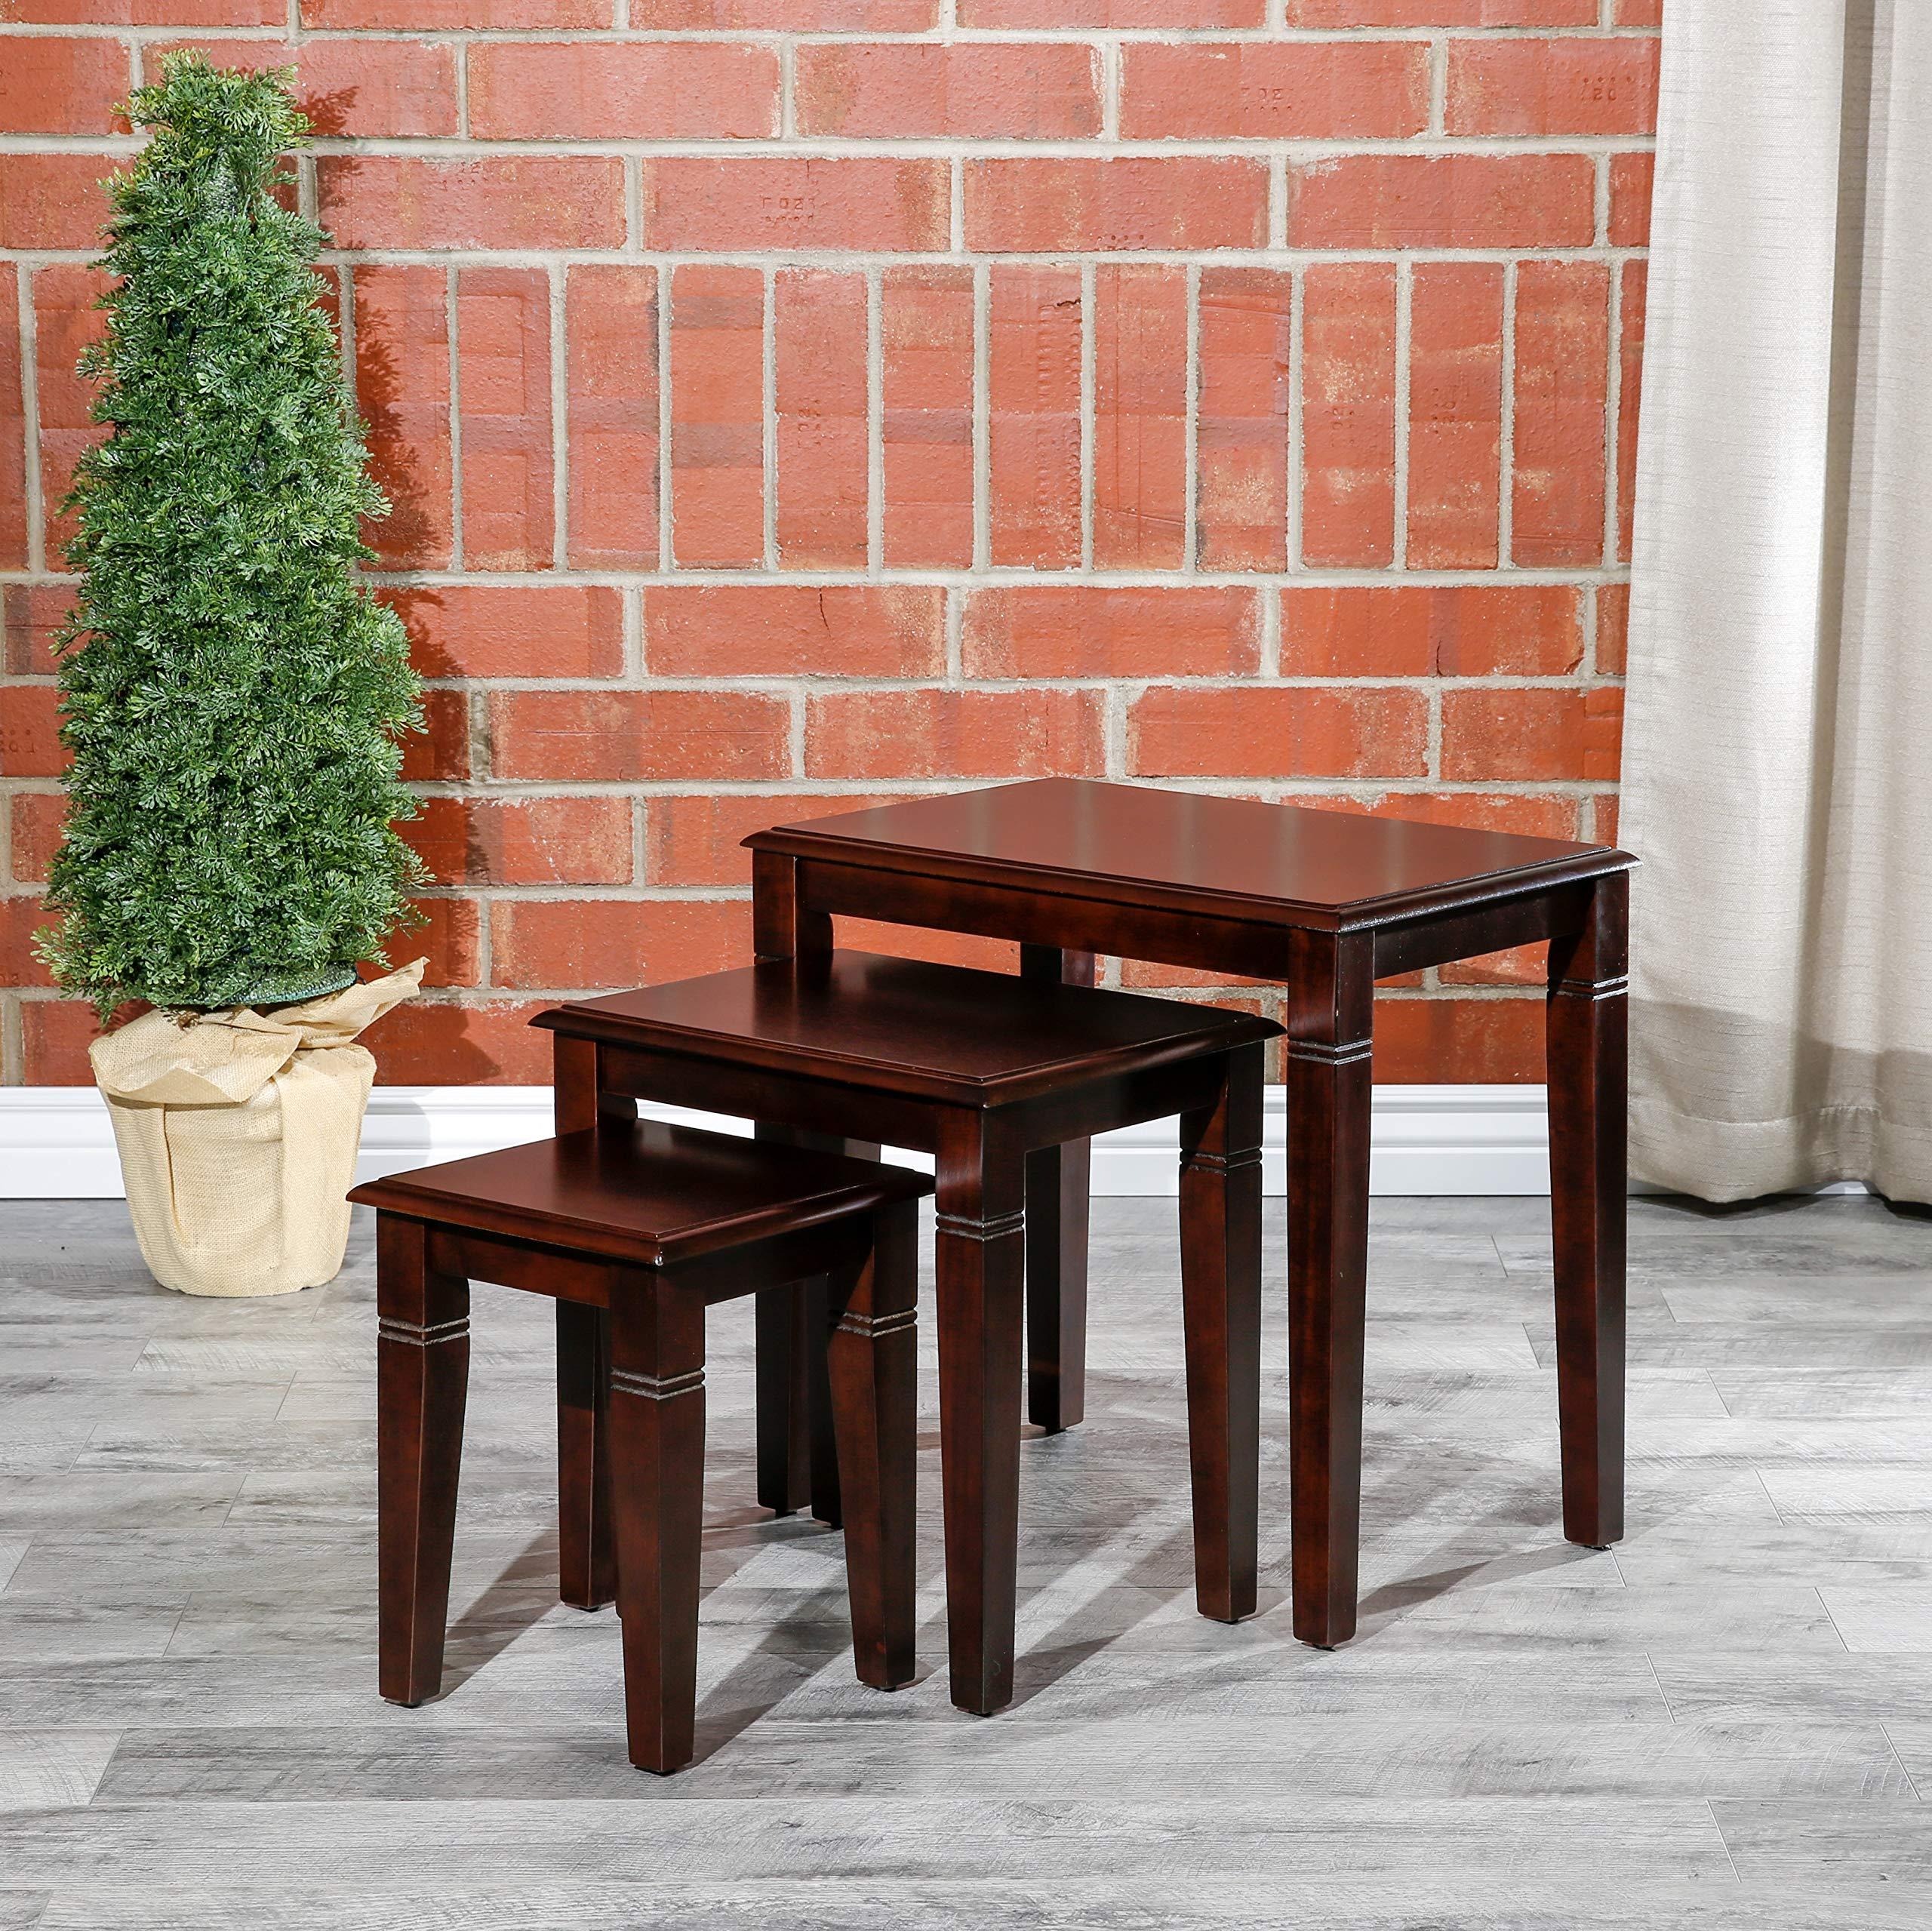 DTY Indoor Living Golden 3-Piece Nesting Table Collection - Dark Brown by DTY